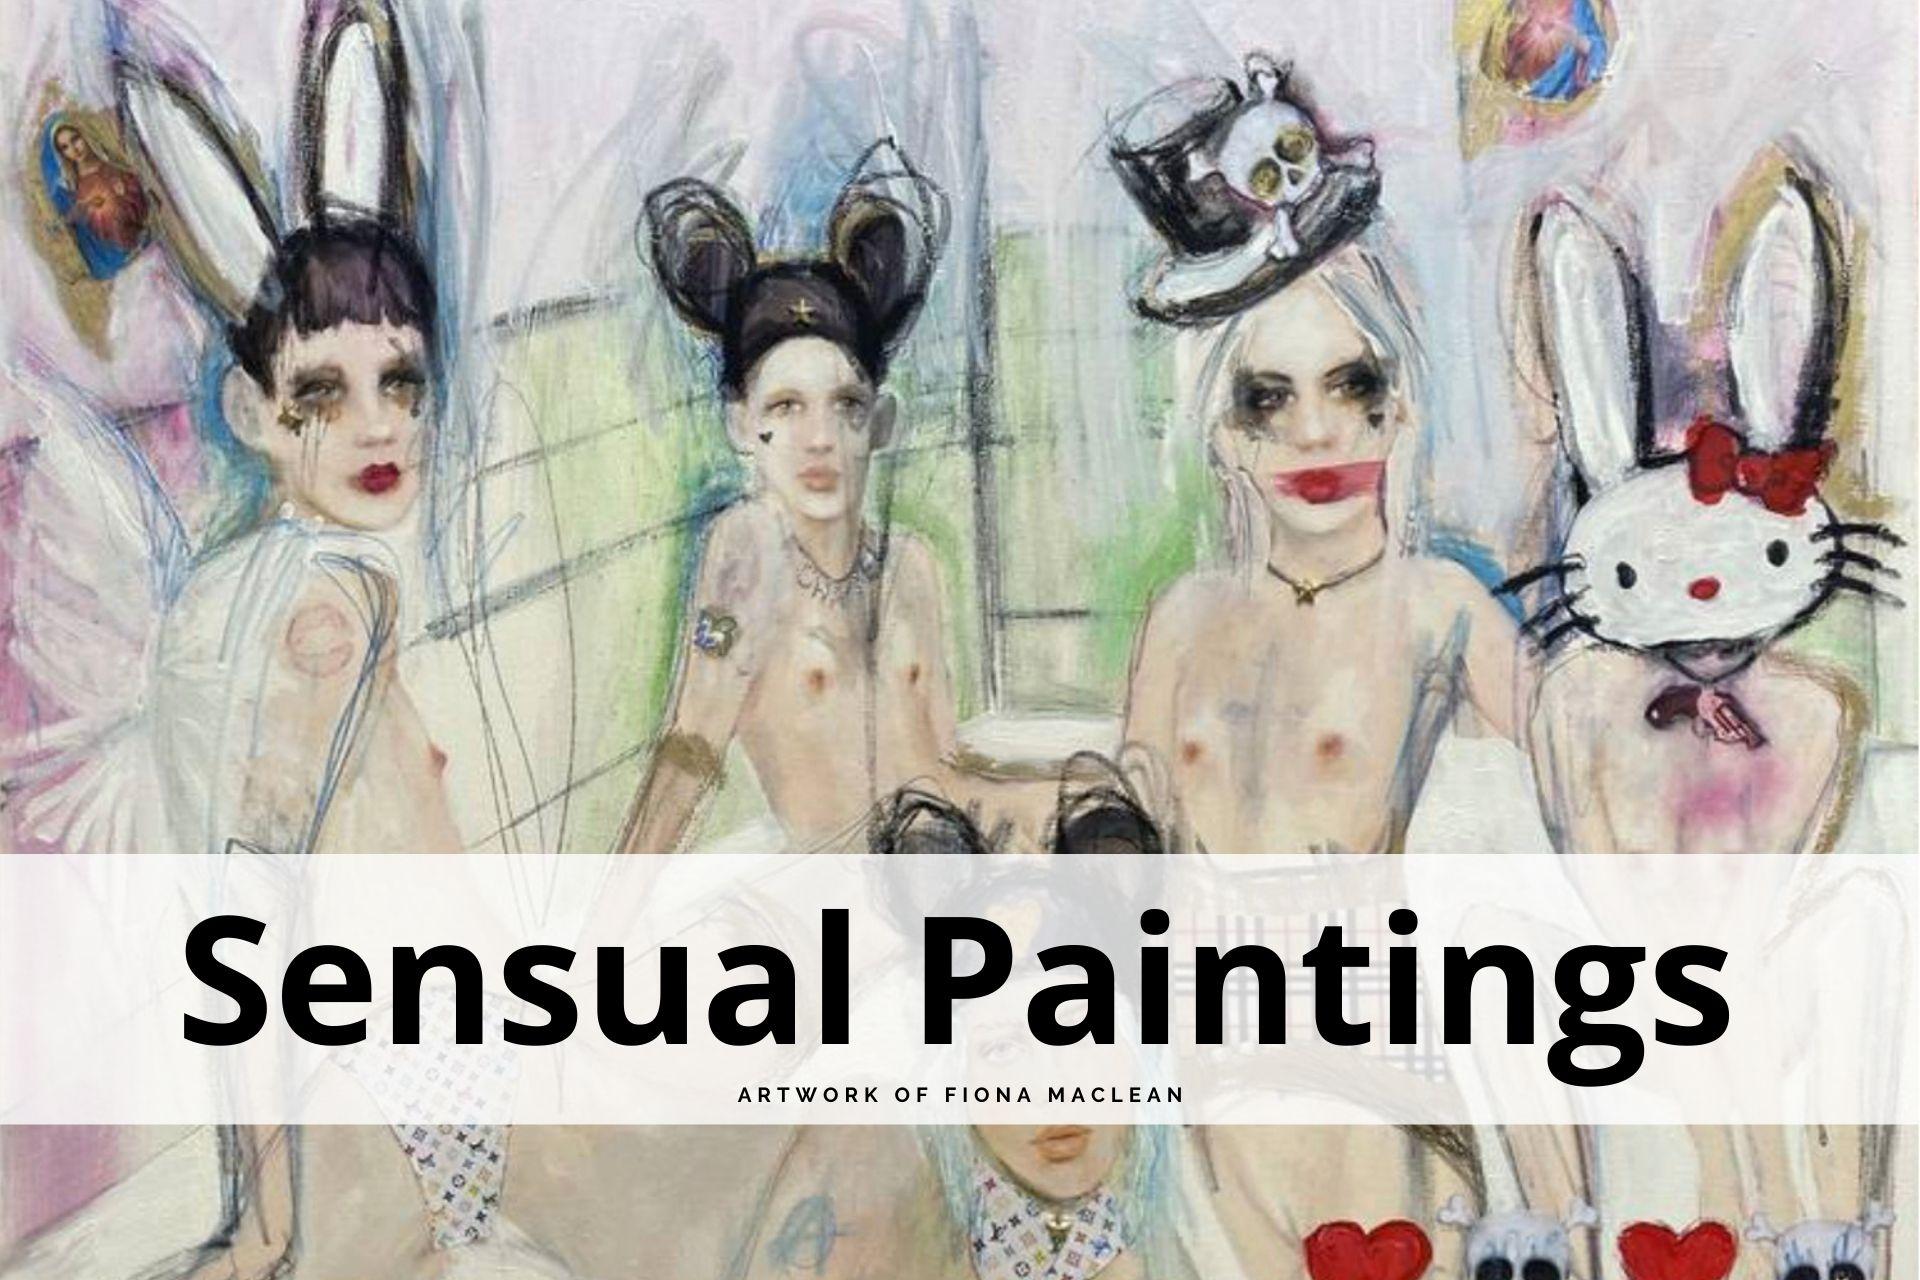 sensual paintings